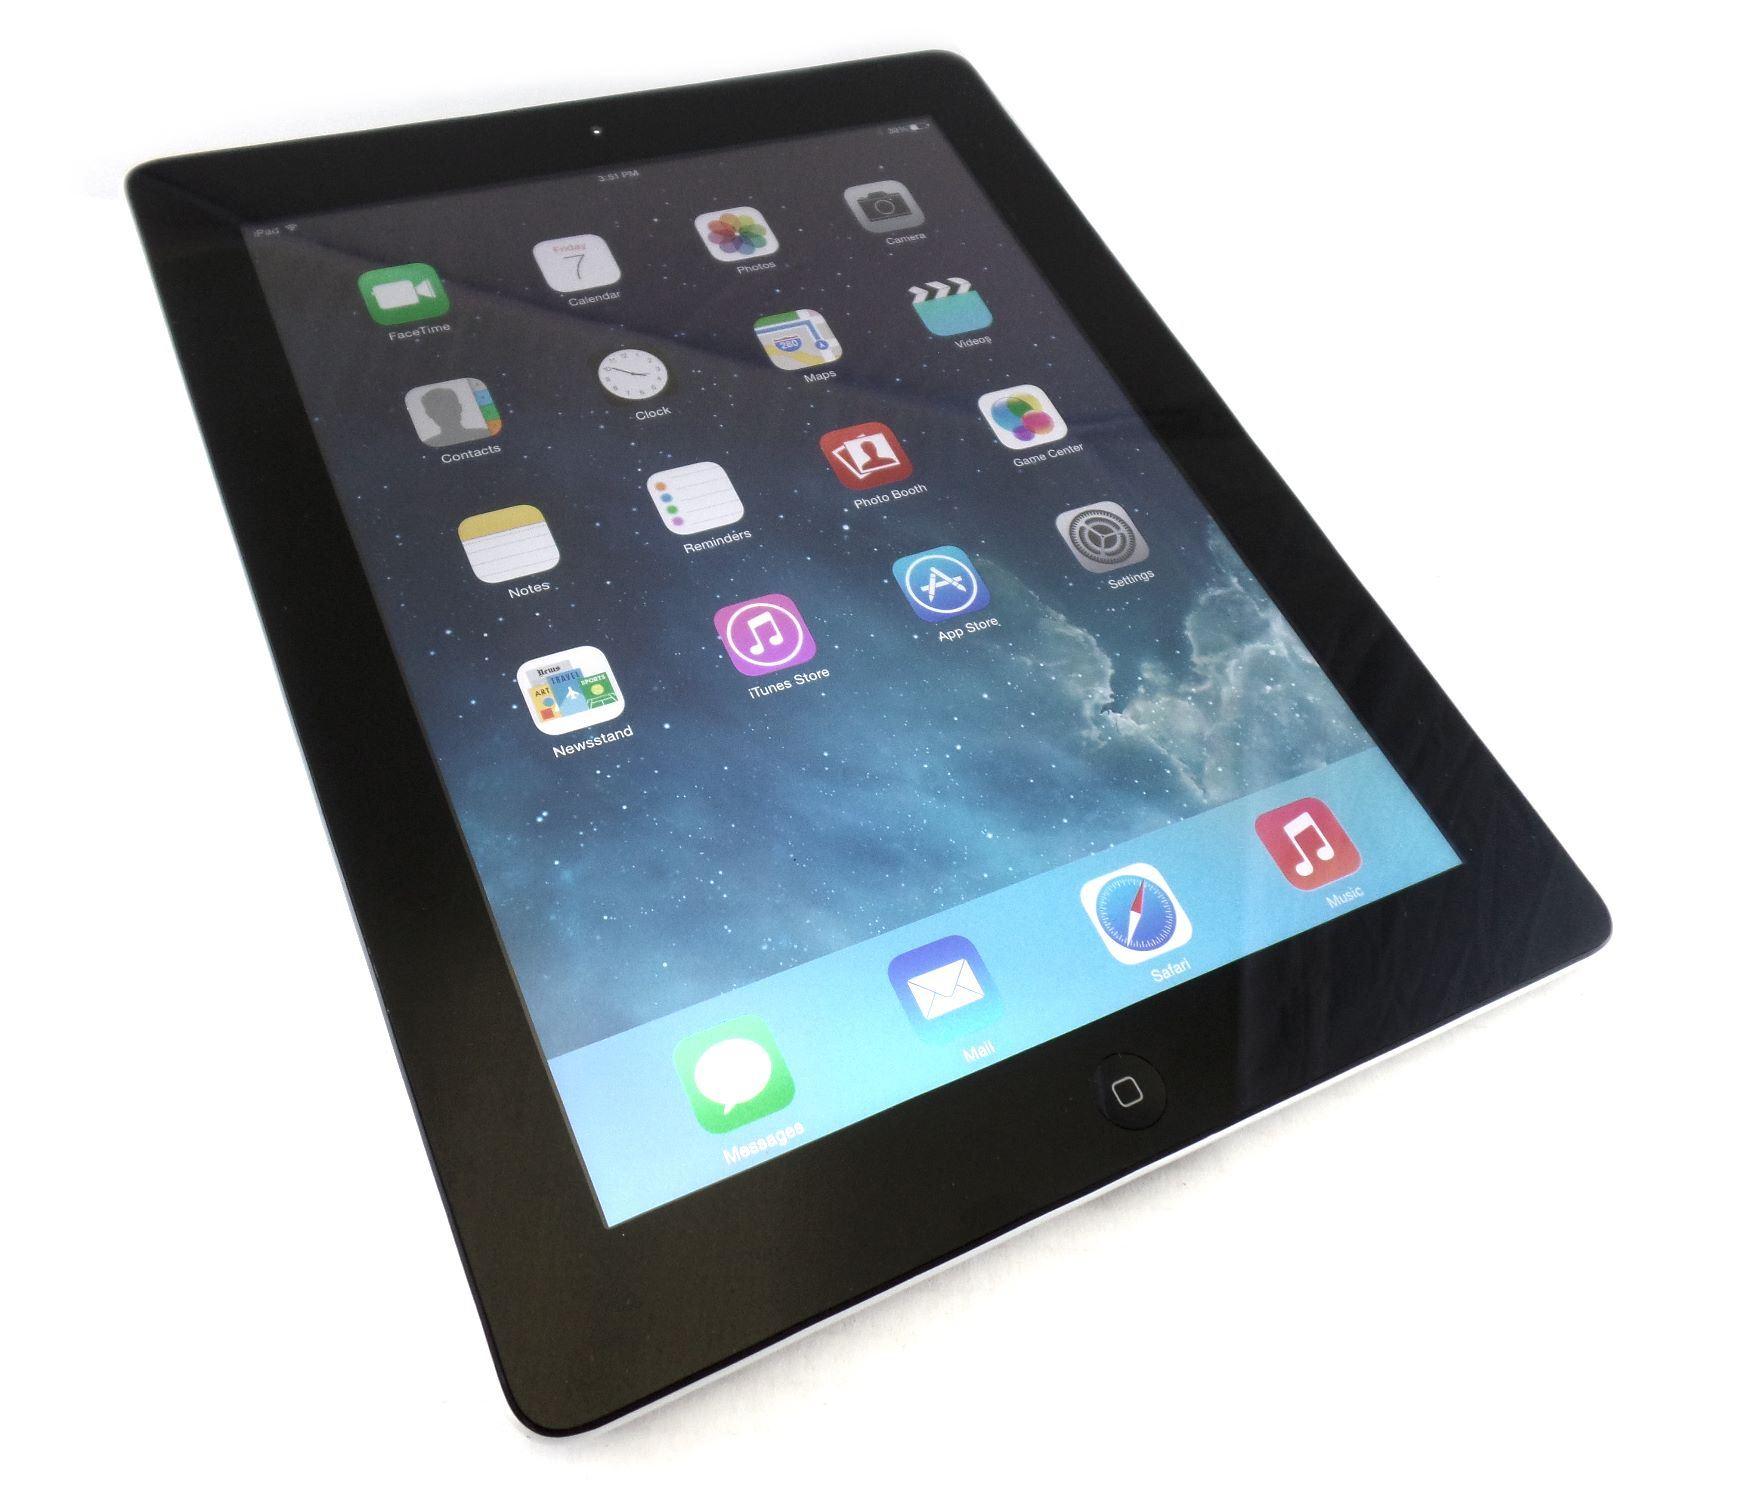 apple ipad 3 16gb 32gb 64gb 128gb wifi cellular black and. Black Bedroom Furniture Sets. Home Design Ideas